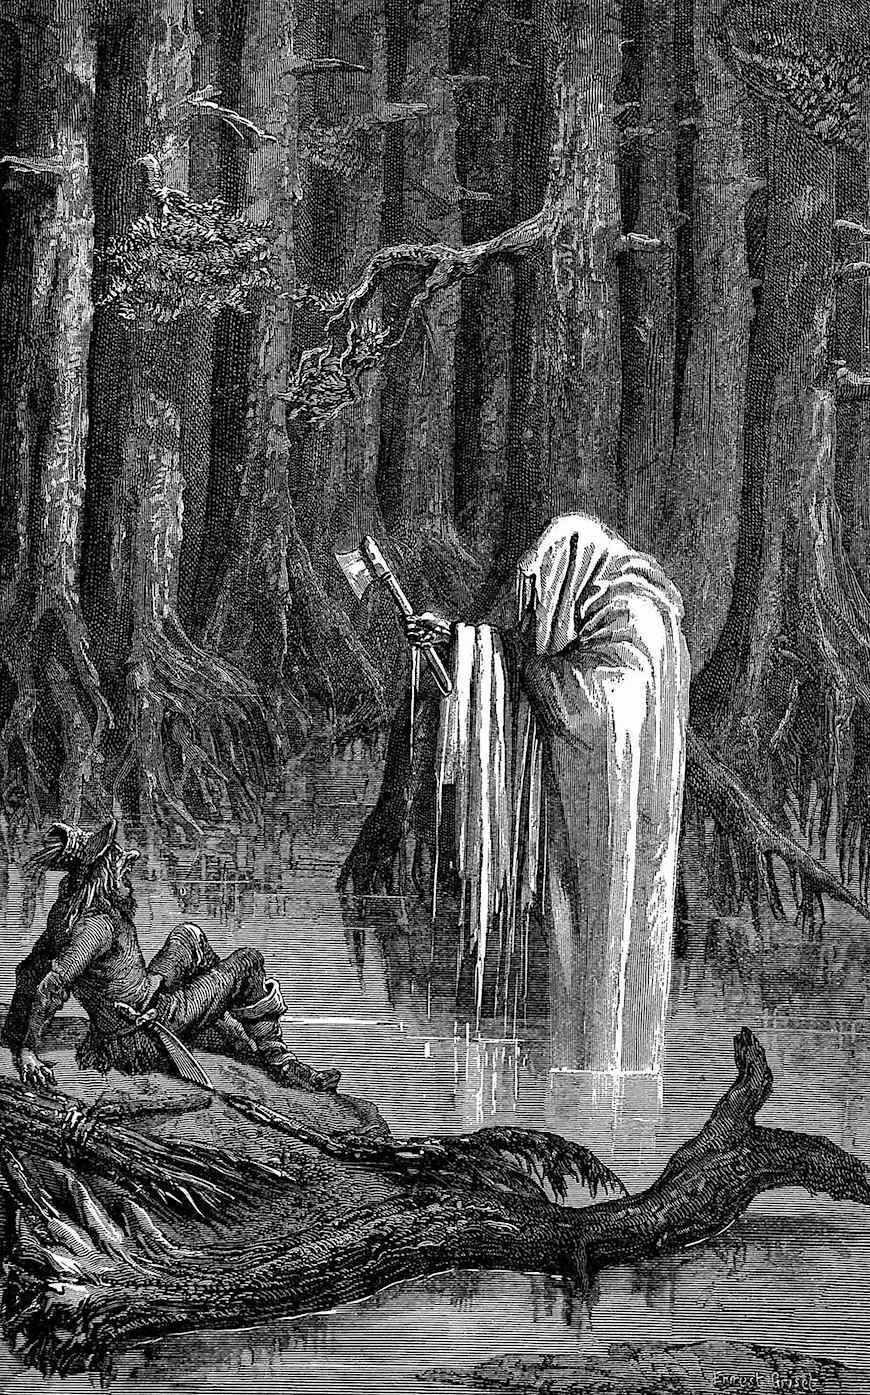 an Ernest Griset illustration of a swamp ghost